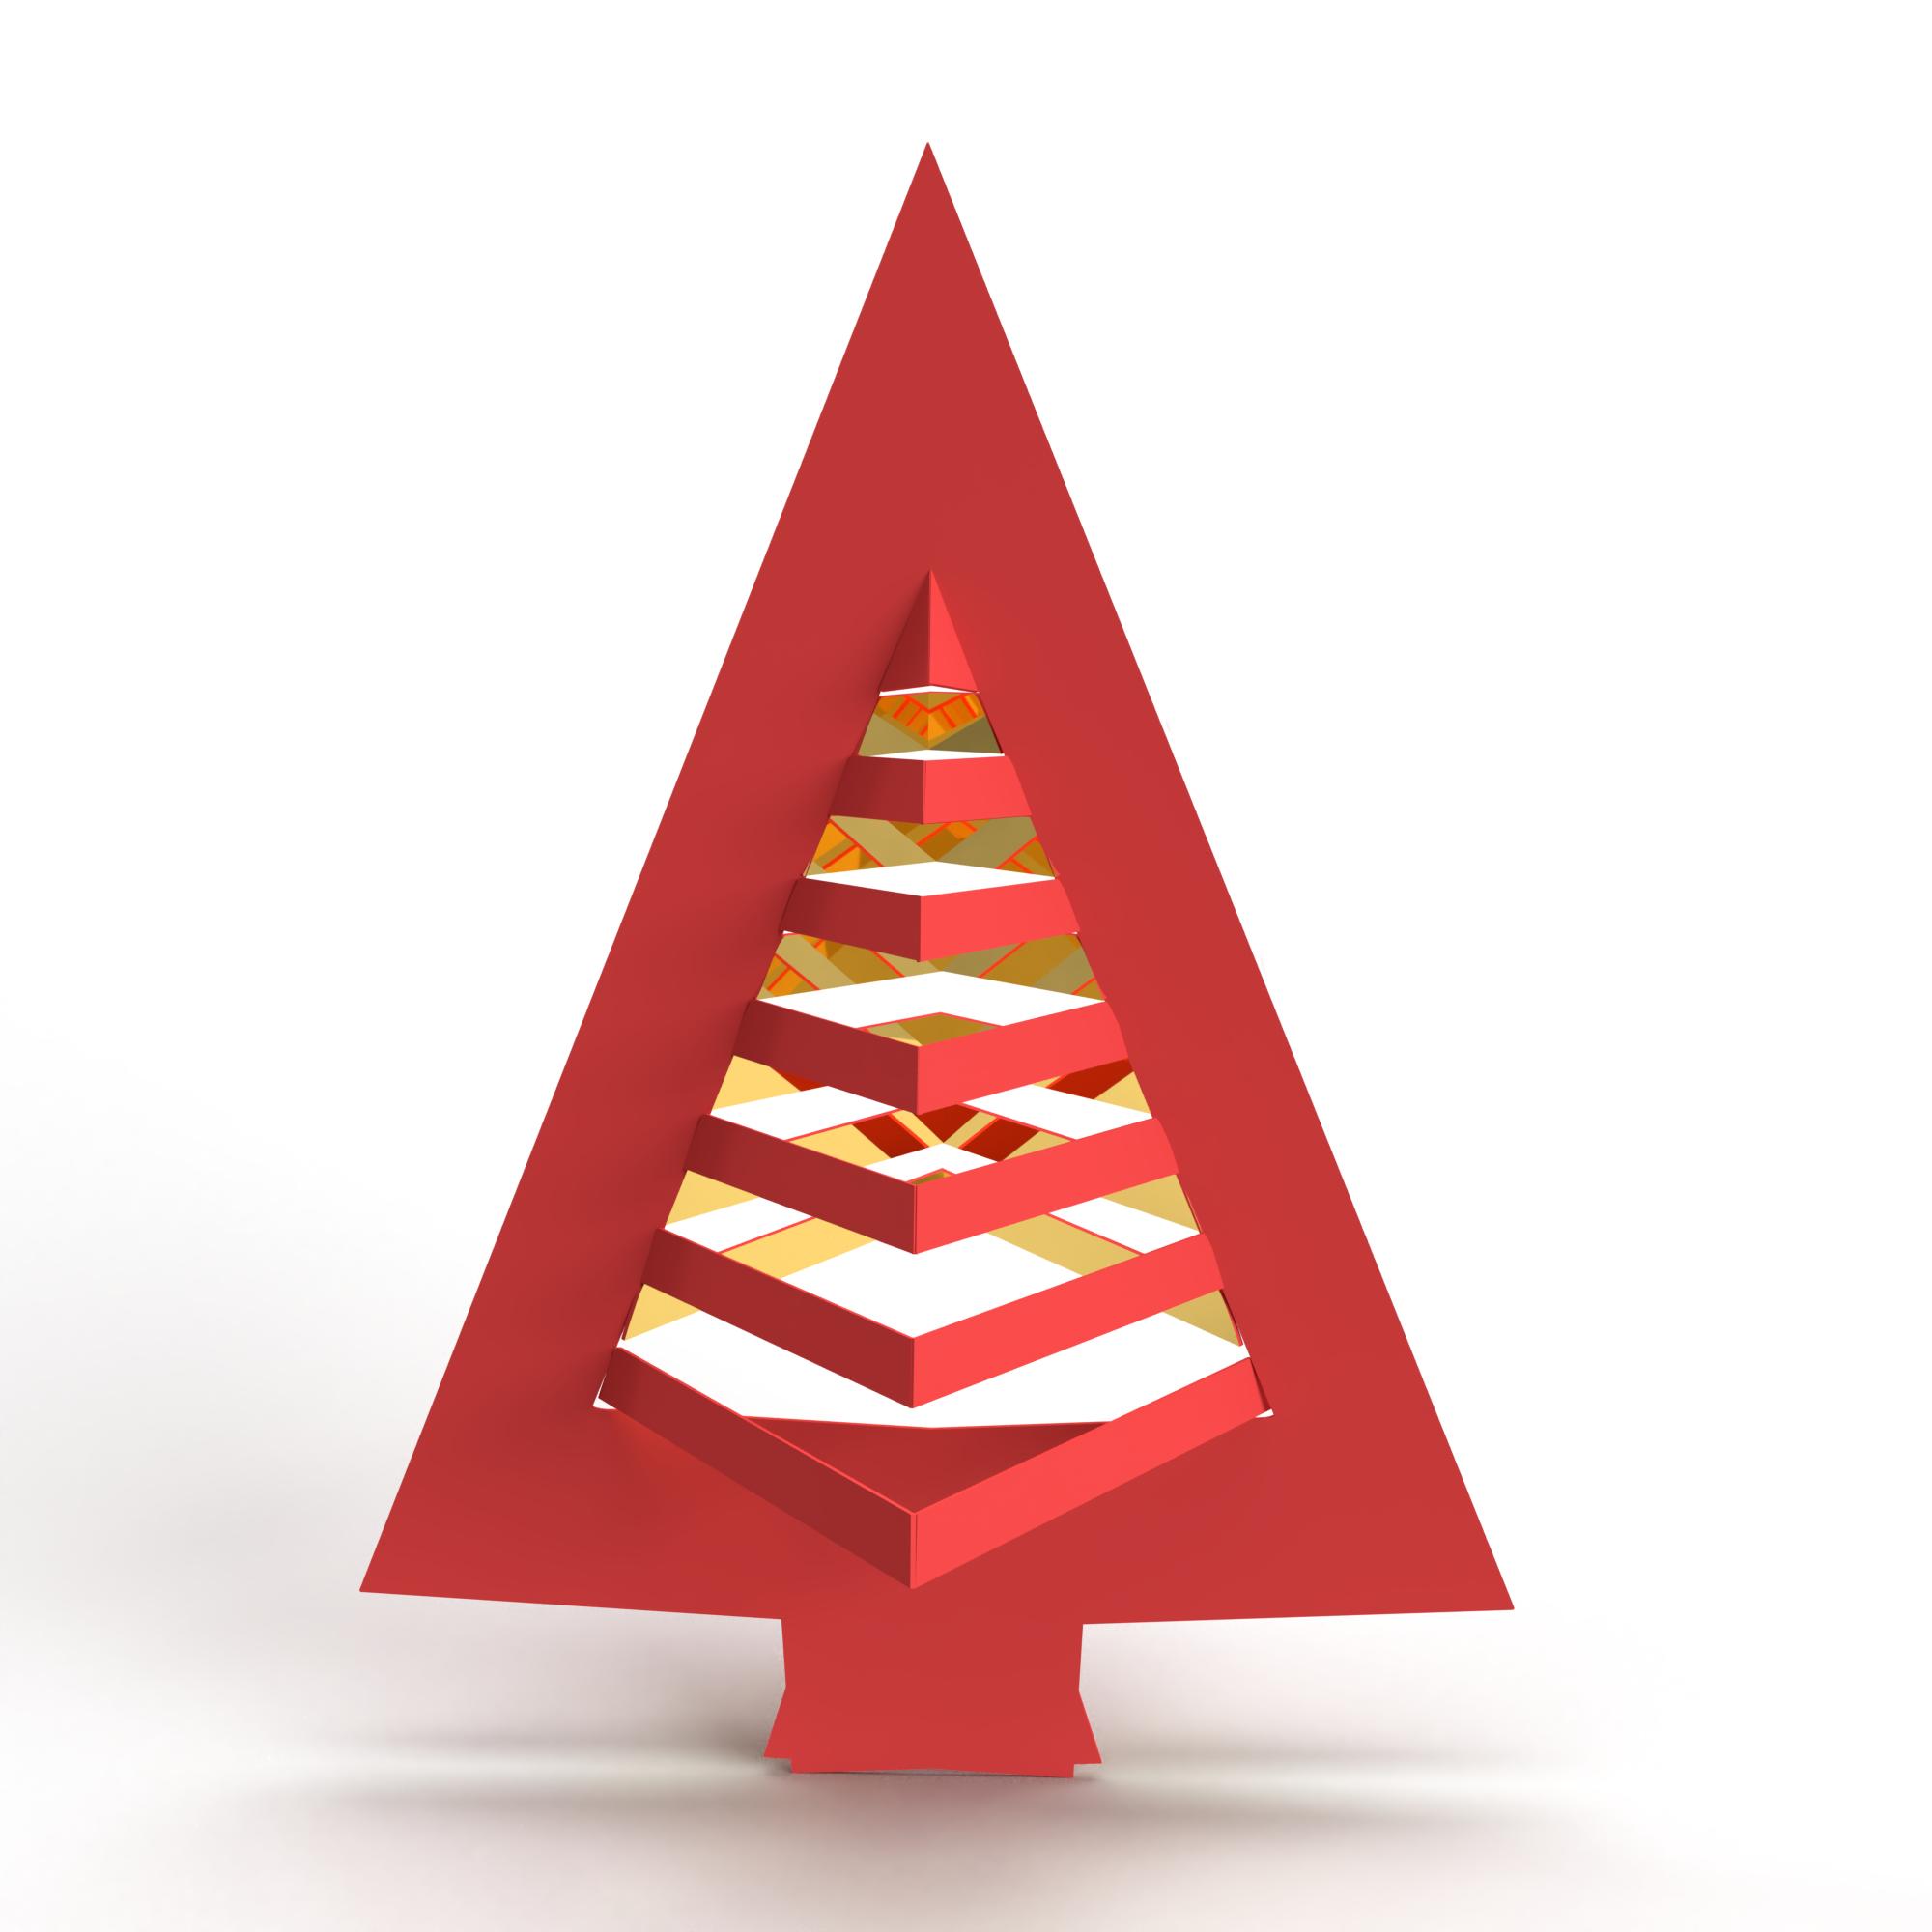 A decorative Christmas tree concept.